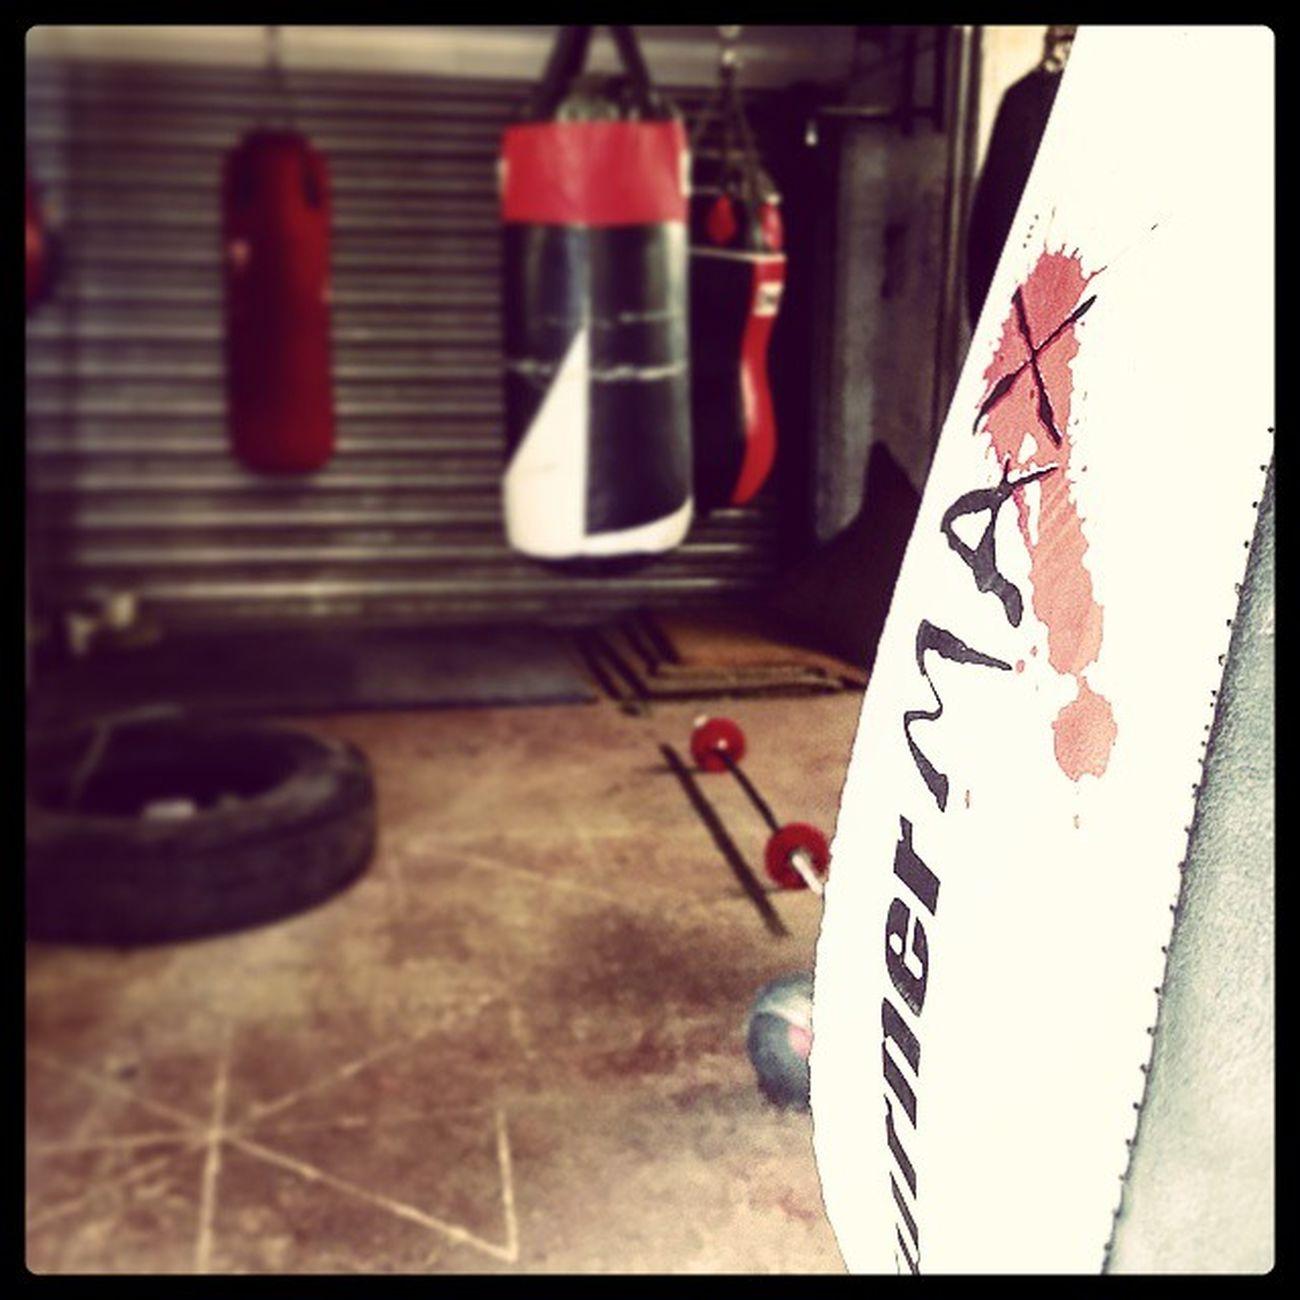 Boxing Punch Punchbag Bradbyclub Gym Gloves Hit Hard